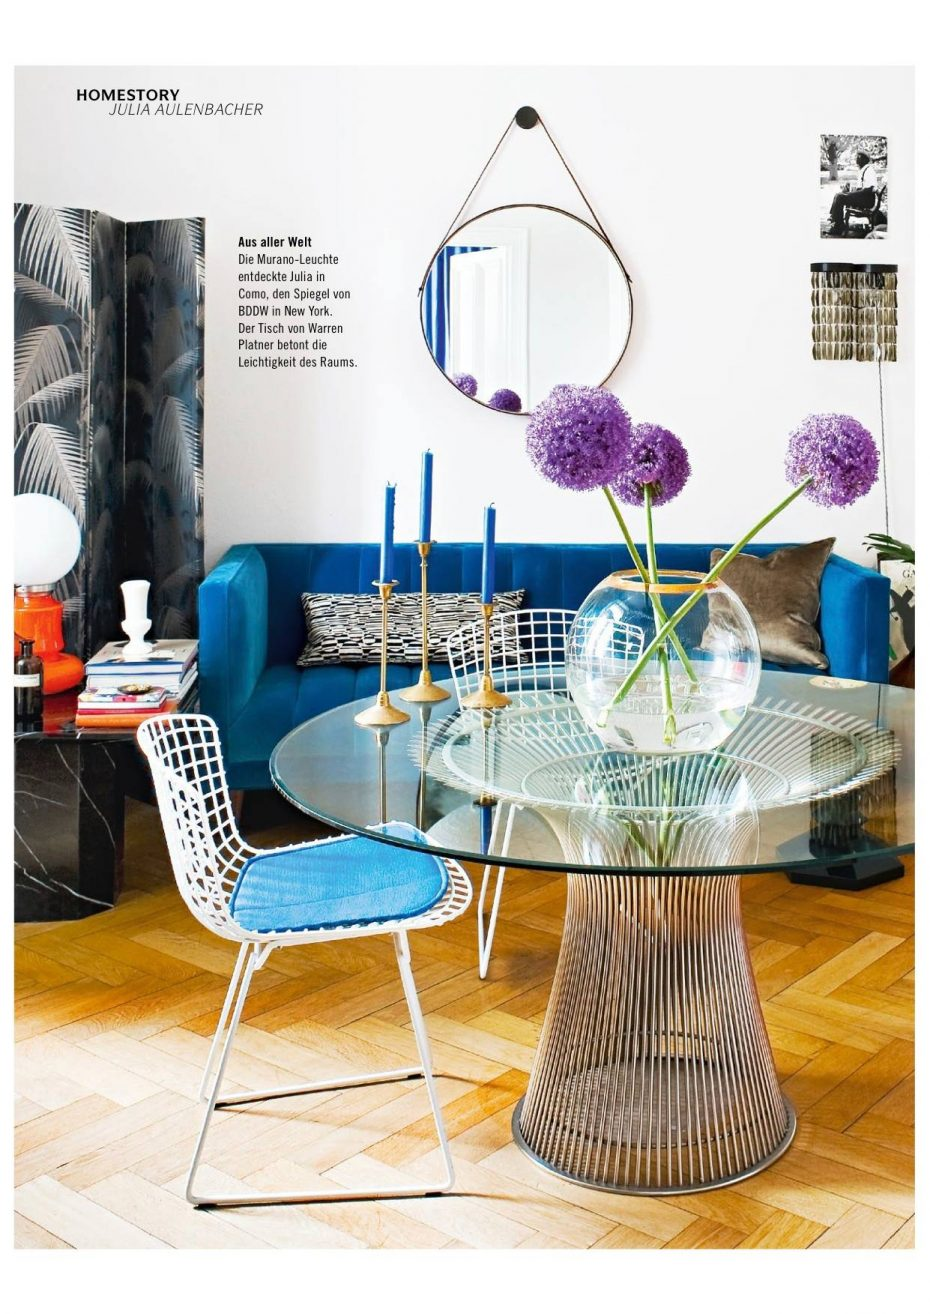 Julia Aulenbacher - Interiors +++ zu Hause wohnen 0